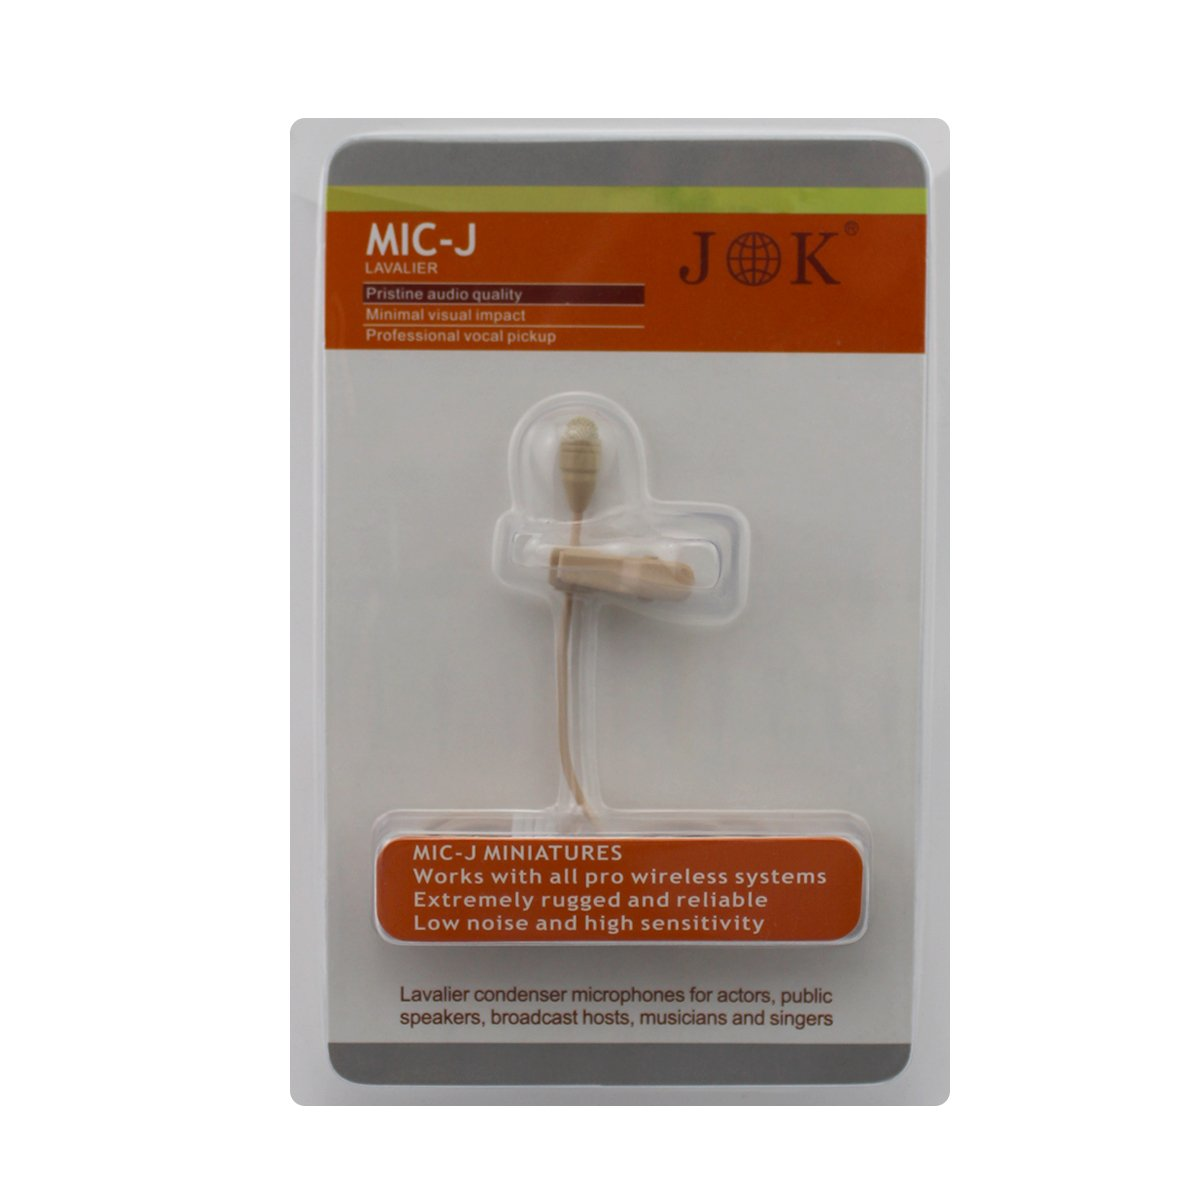 Pro Beige Lavalier Lapel Condenser Microphone JK MIC-J 050 for Sennheiser Wireless Transmitter JK ELECTRONICS JK-Mic-050-35MM